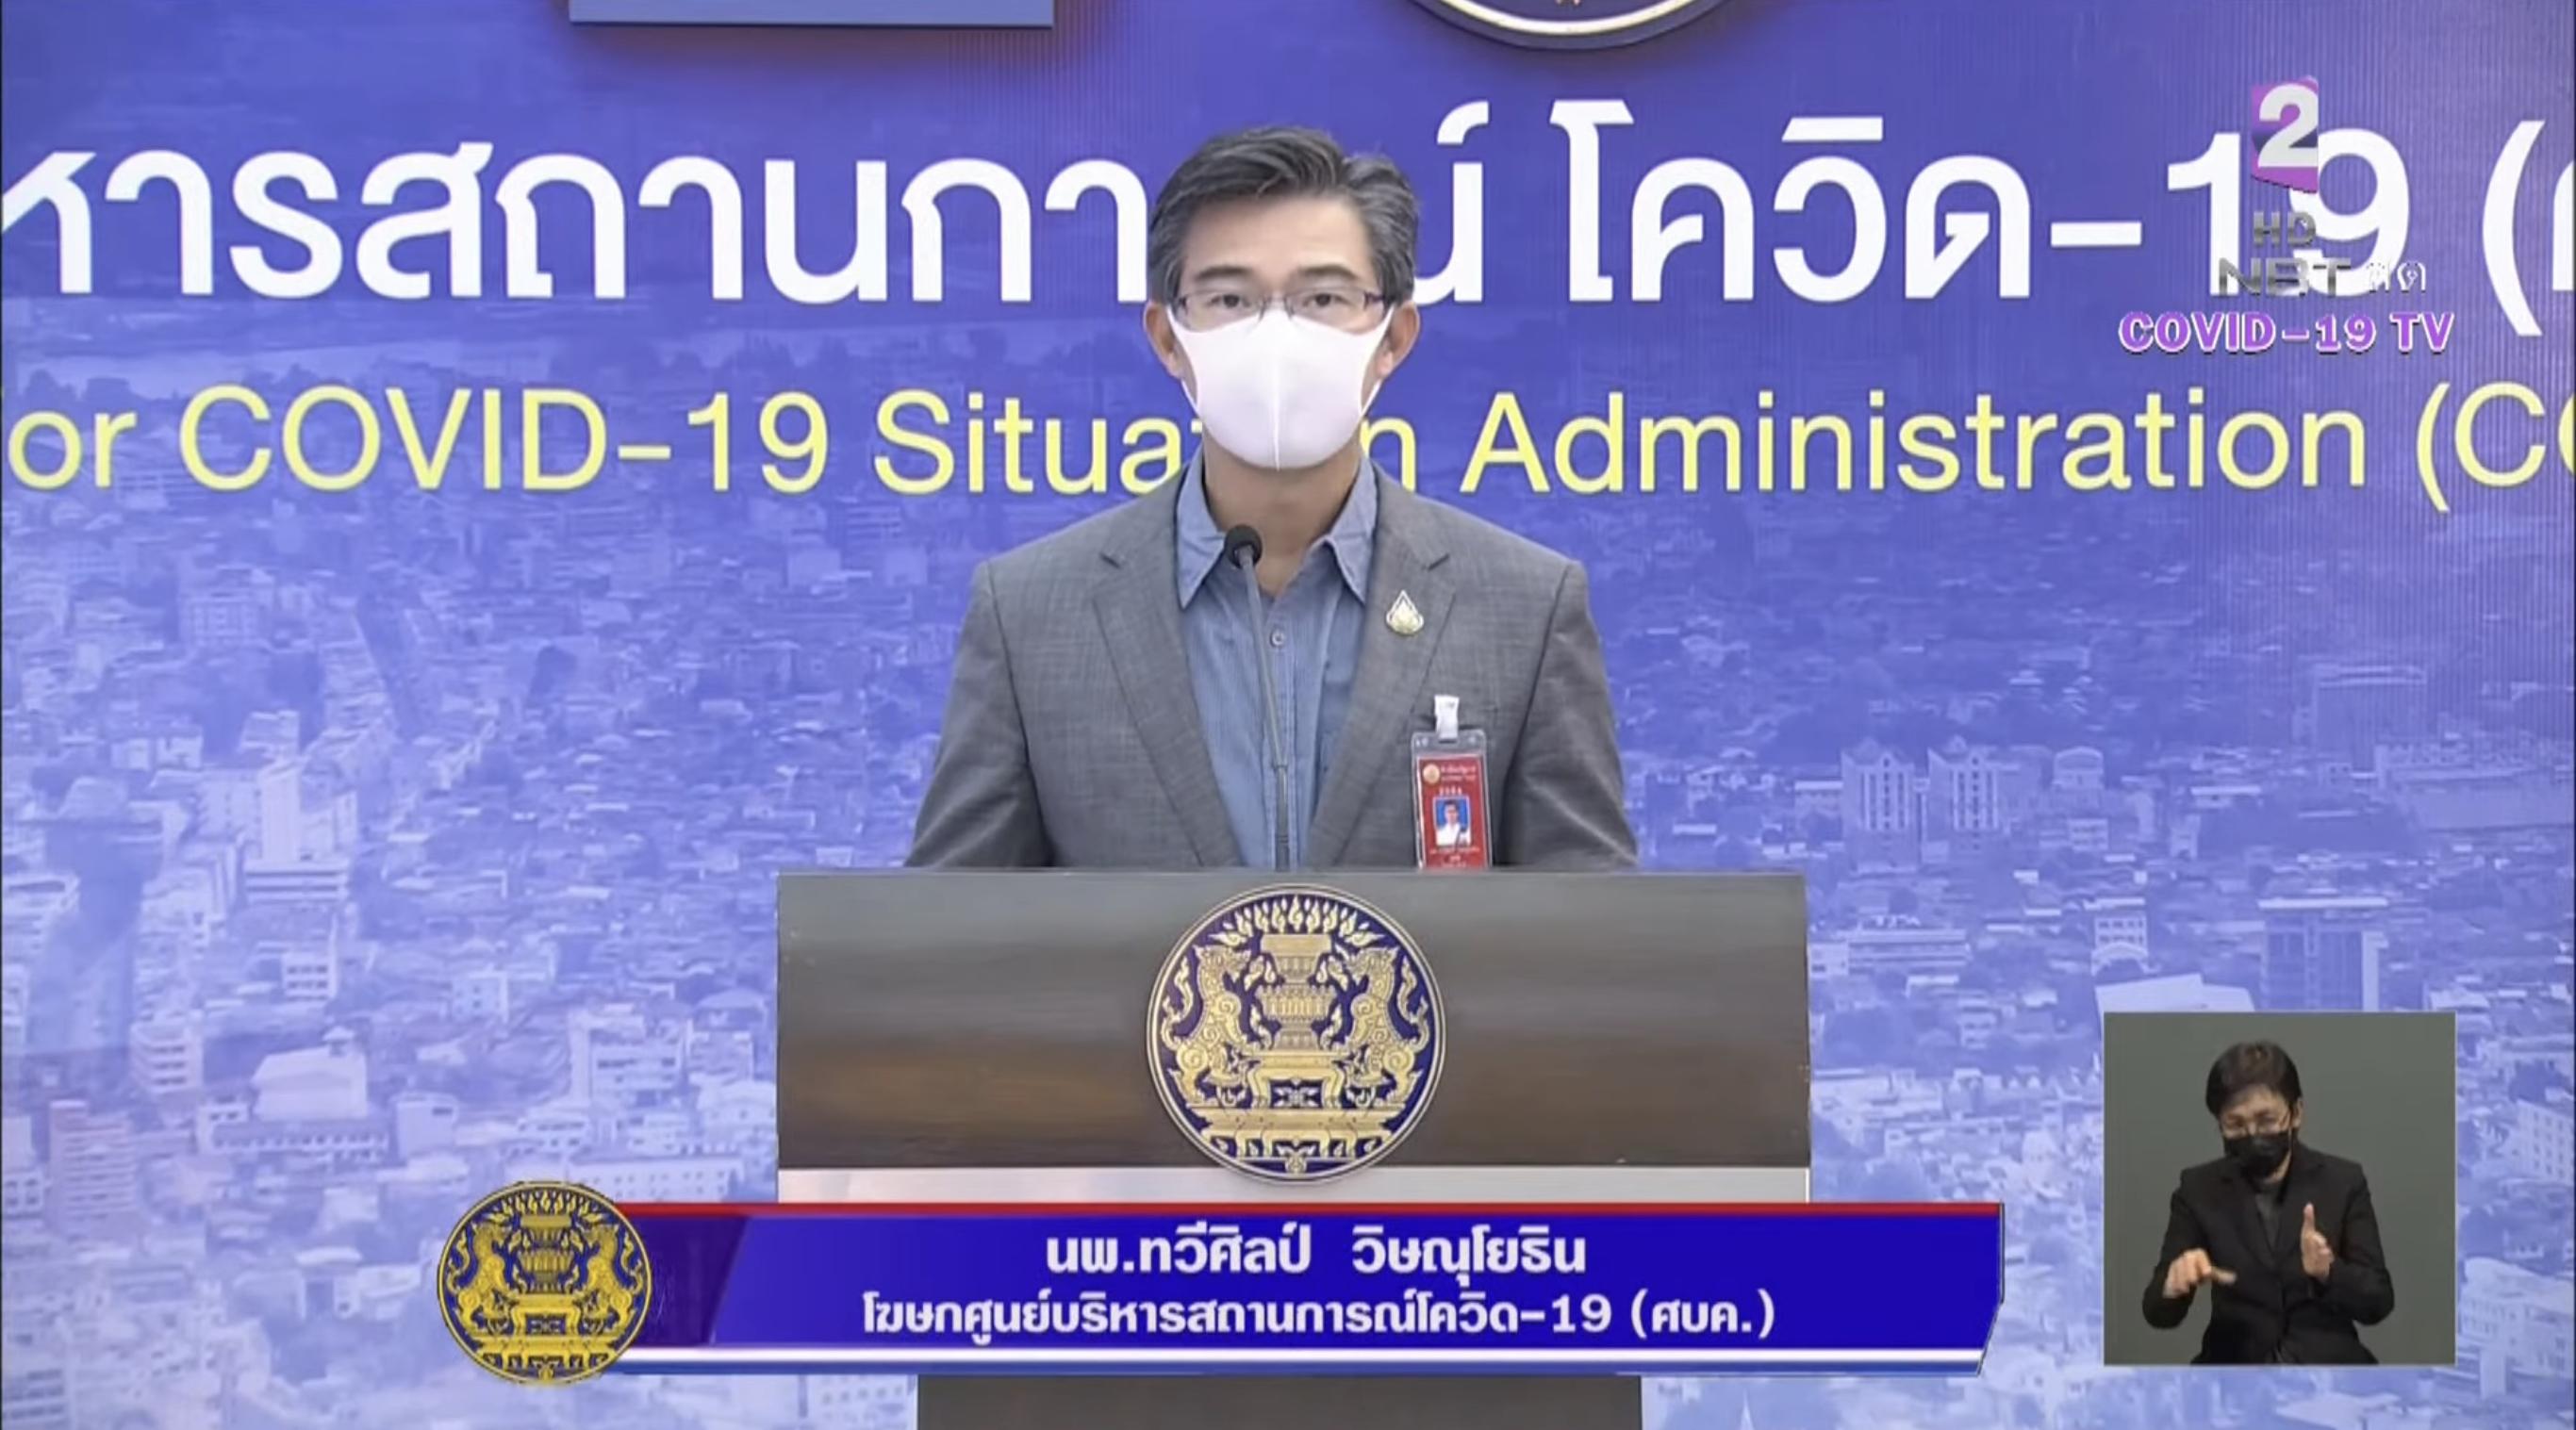 Dr.Taweesin Wissanuyothin